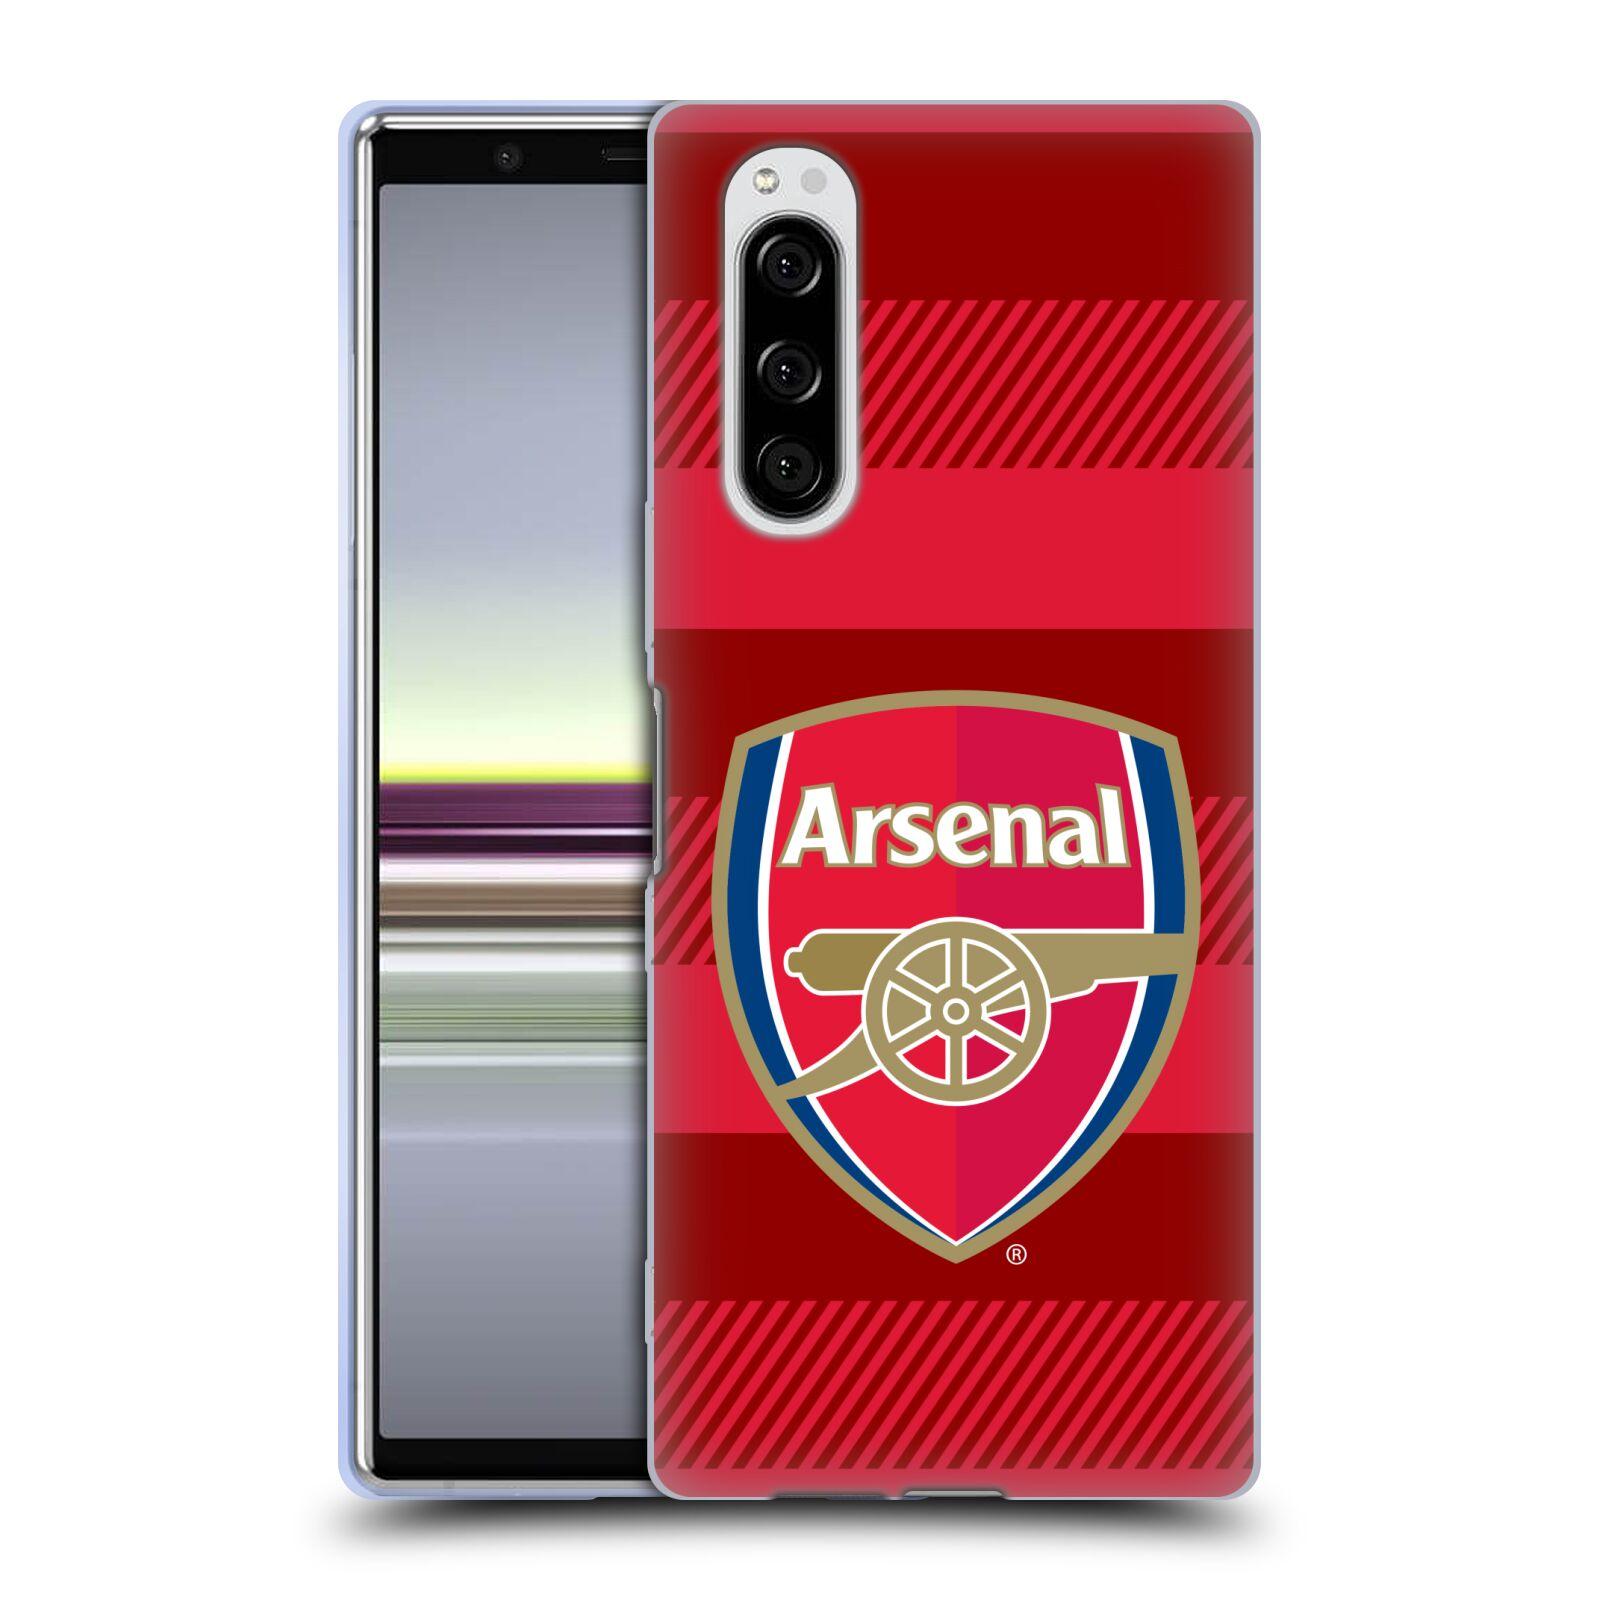 Silikonové pouzdro na mobil Sony Xperia 5 - Head Case - Arsenal FC - Logo s pruhy